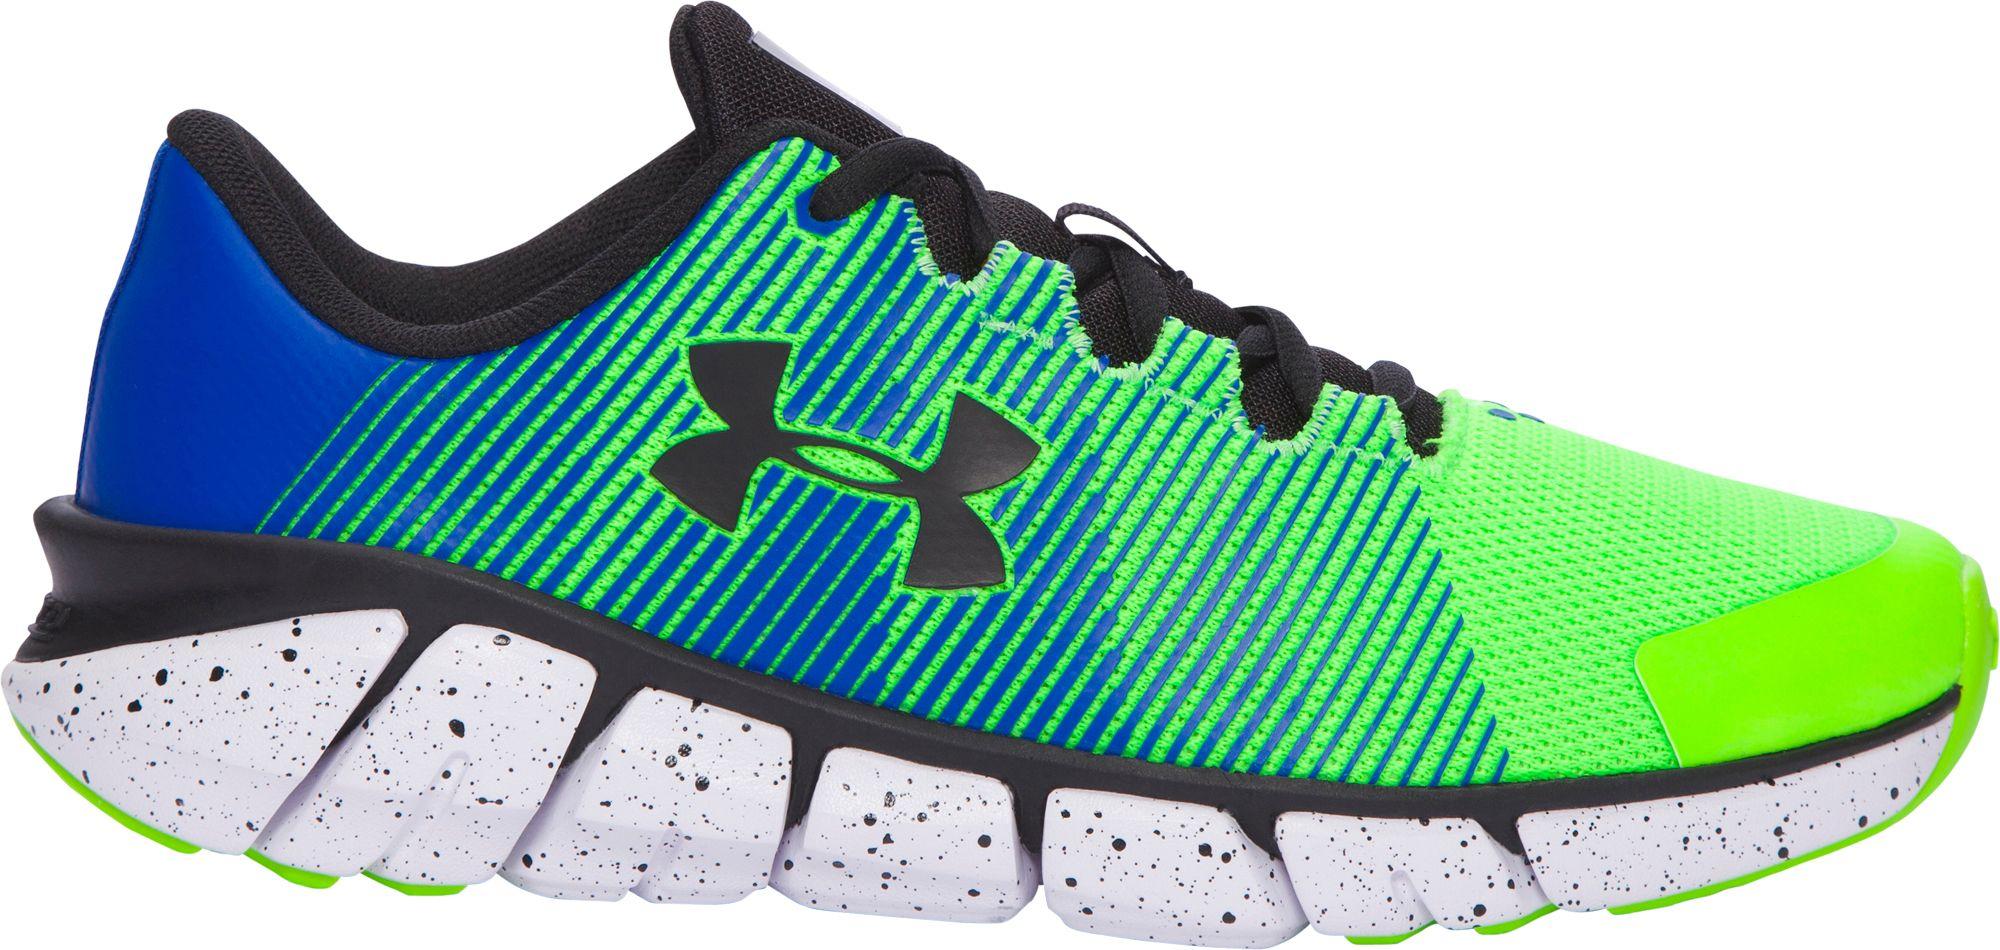 Under Armour Kids' Grade School X Level Scramjet Running Shoes | DICK'S  Sporting Goods